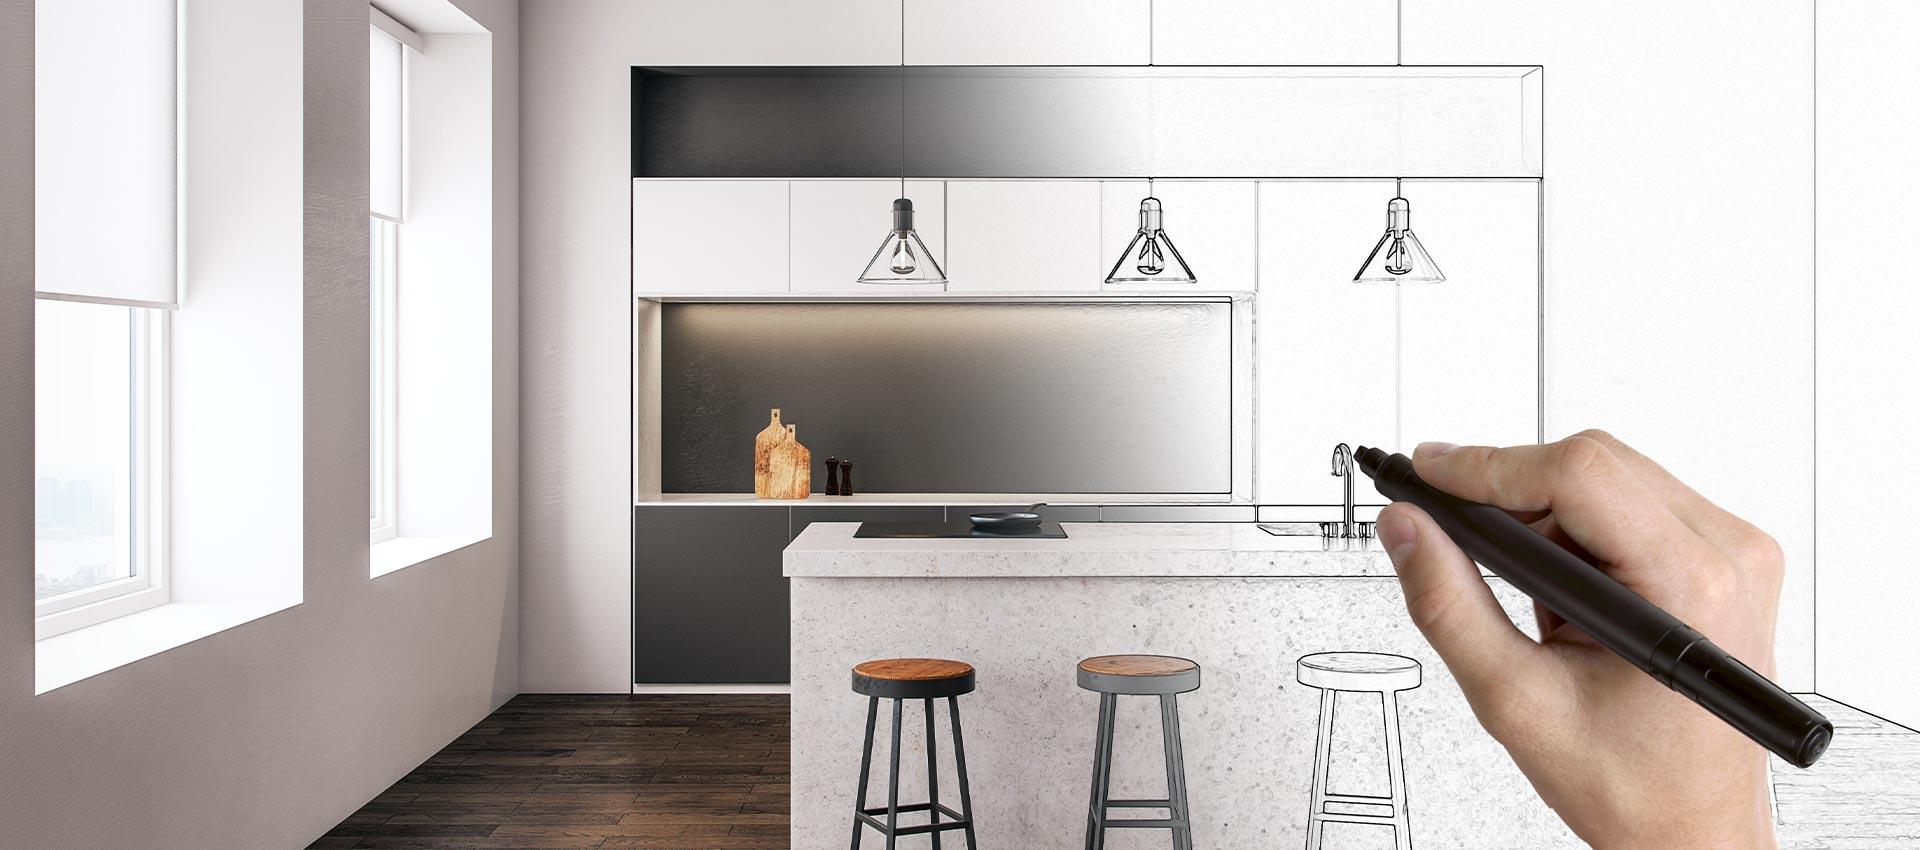 Neue Küche – Teilrenovation oder kompletter Umbau?